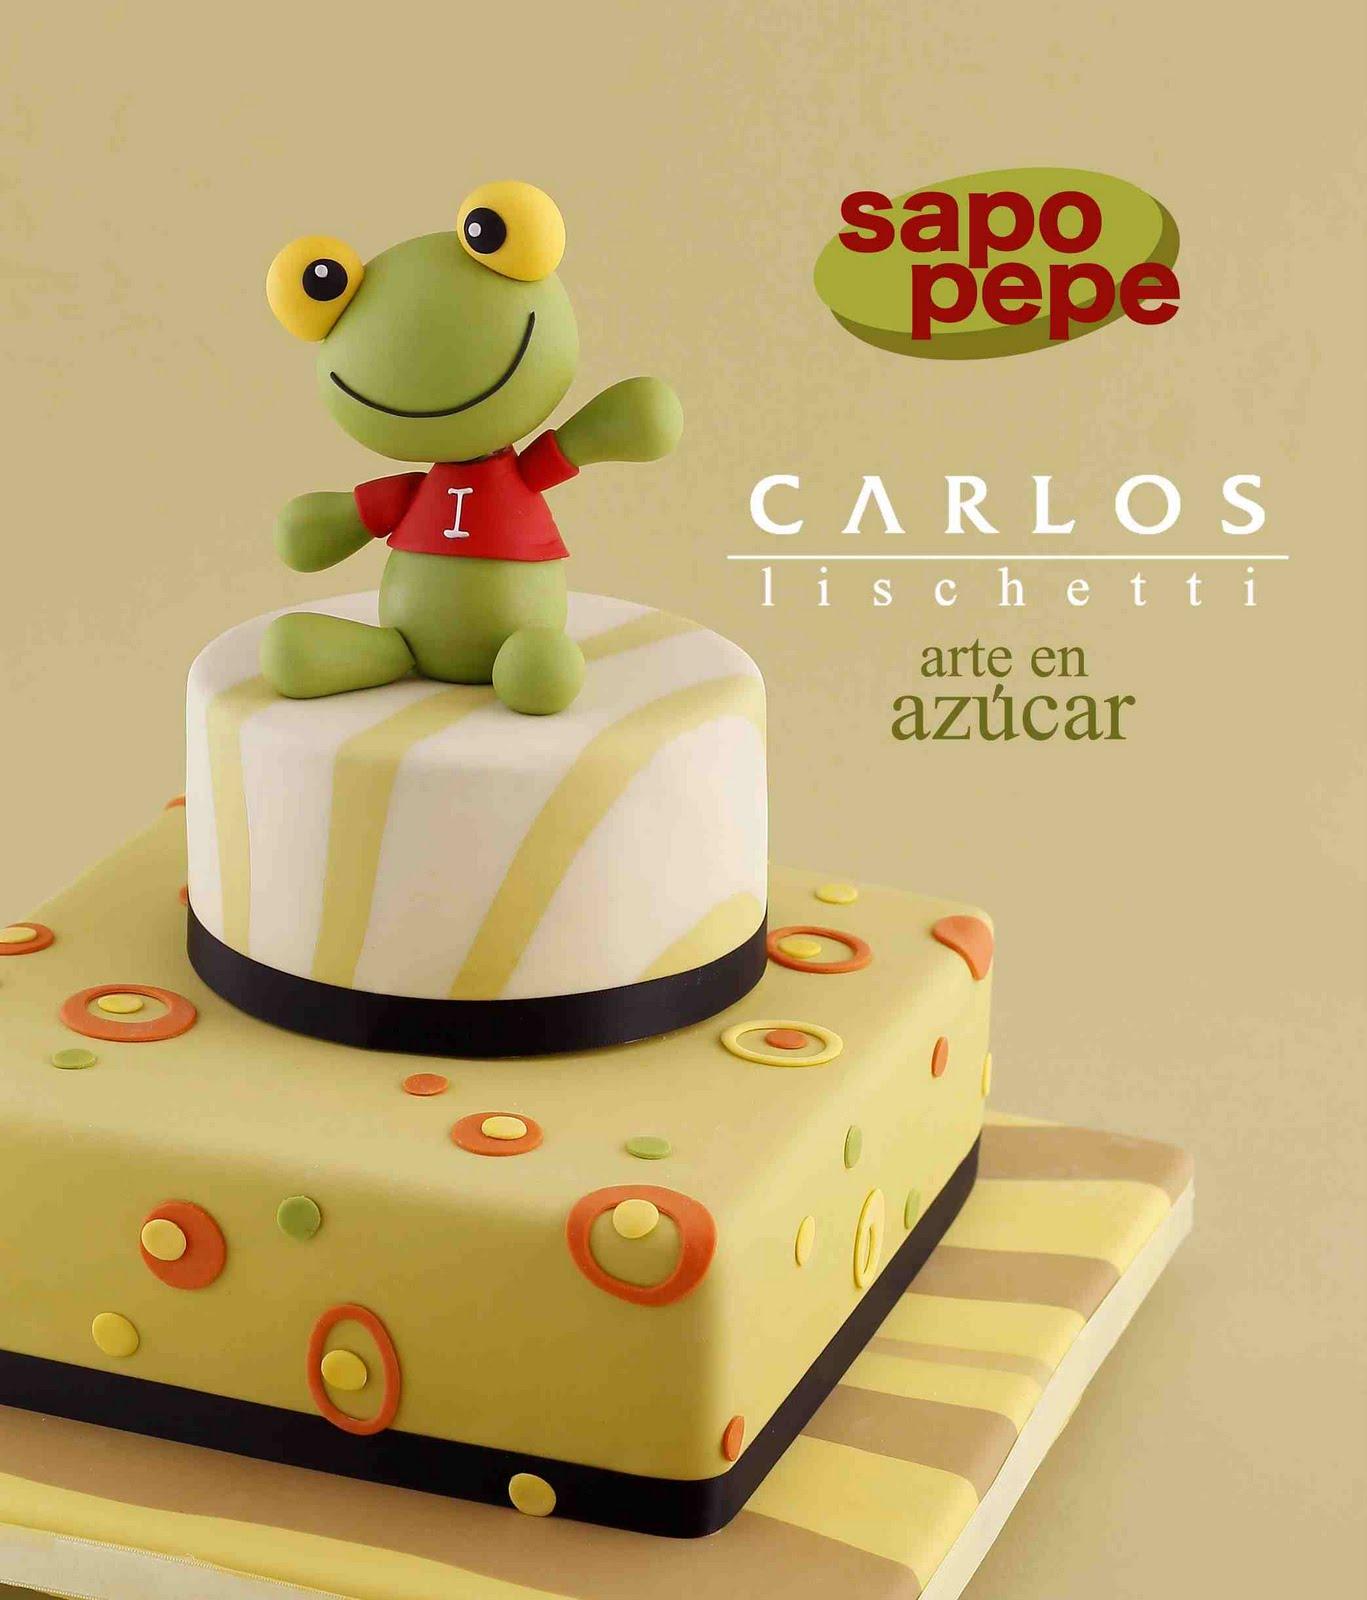 Cake Design Carlos : Carlos Lischetti - Sugar Art on Pinterest Sugar Art ...